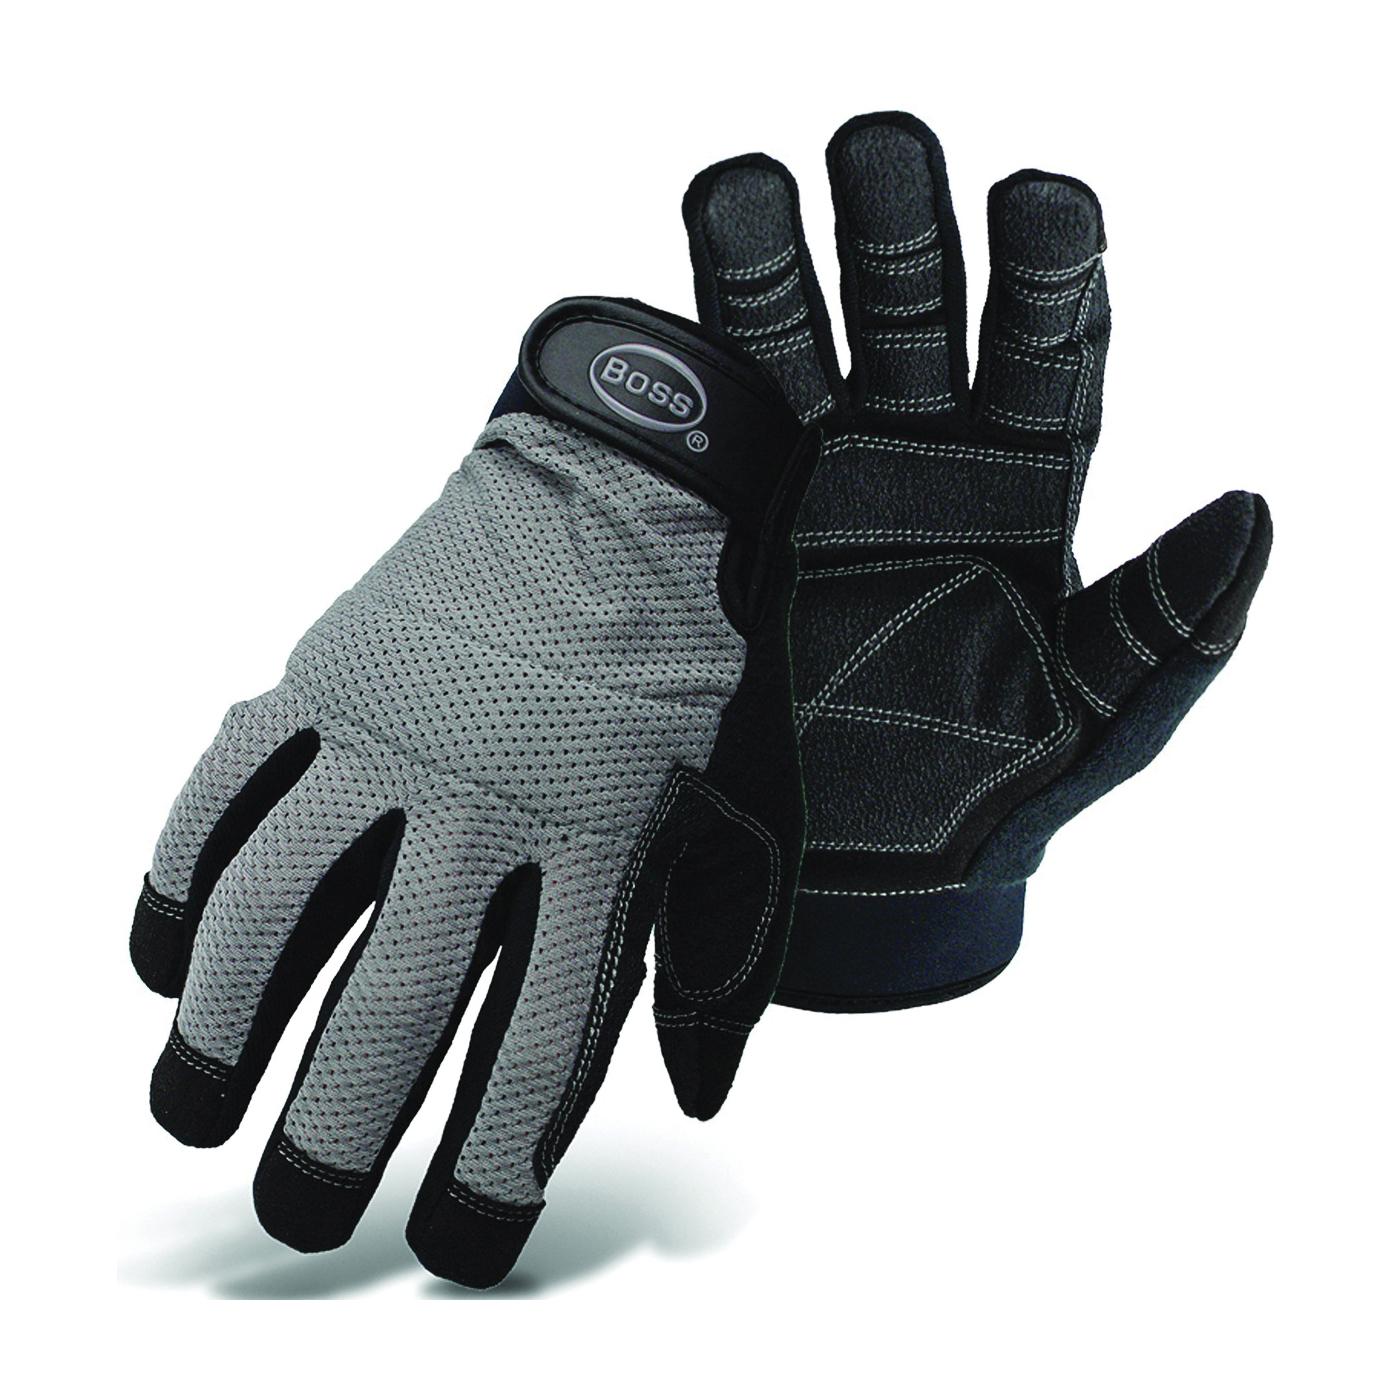 Picture of BOSS 5204L Utility Mechanic's Gloves, L, Wing Thumb, Wrist Strap Cuff, PVC, Black/Gray